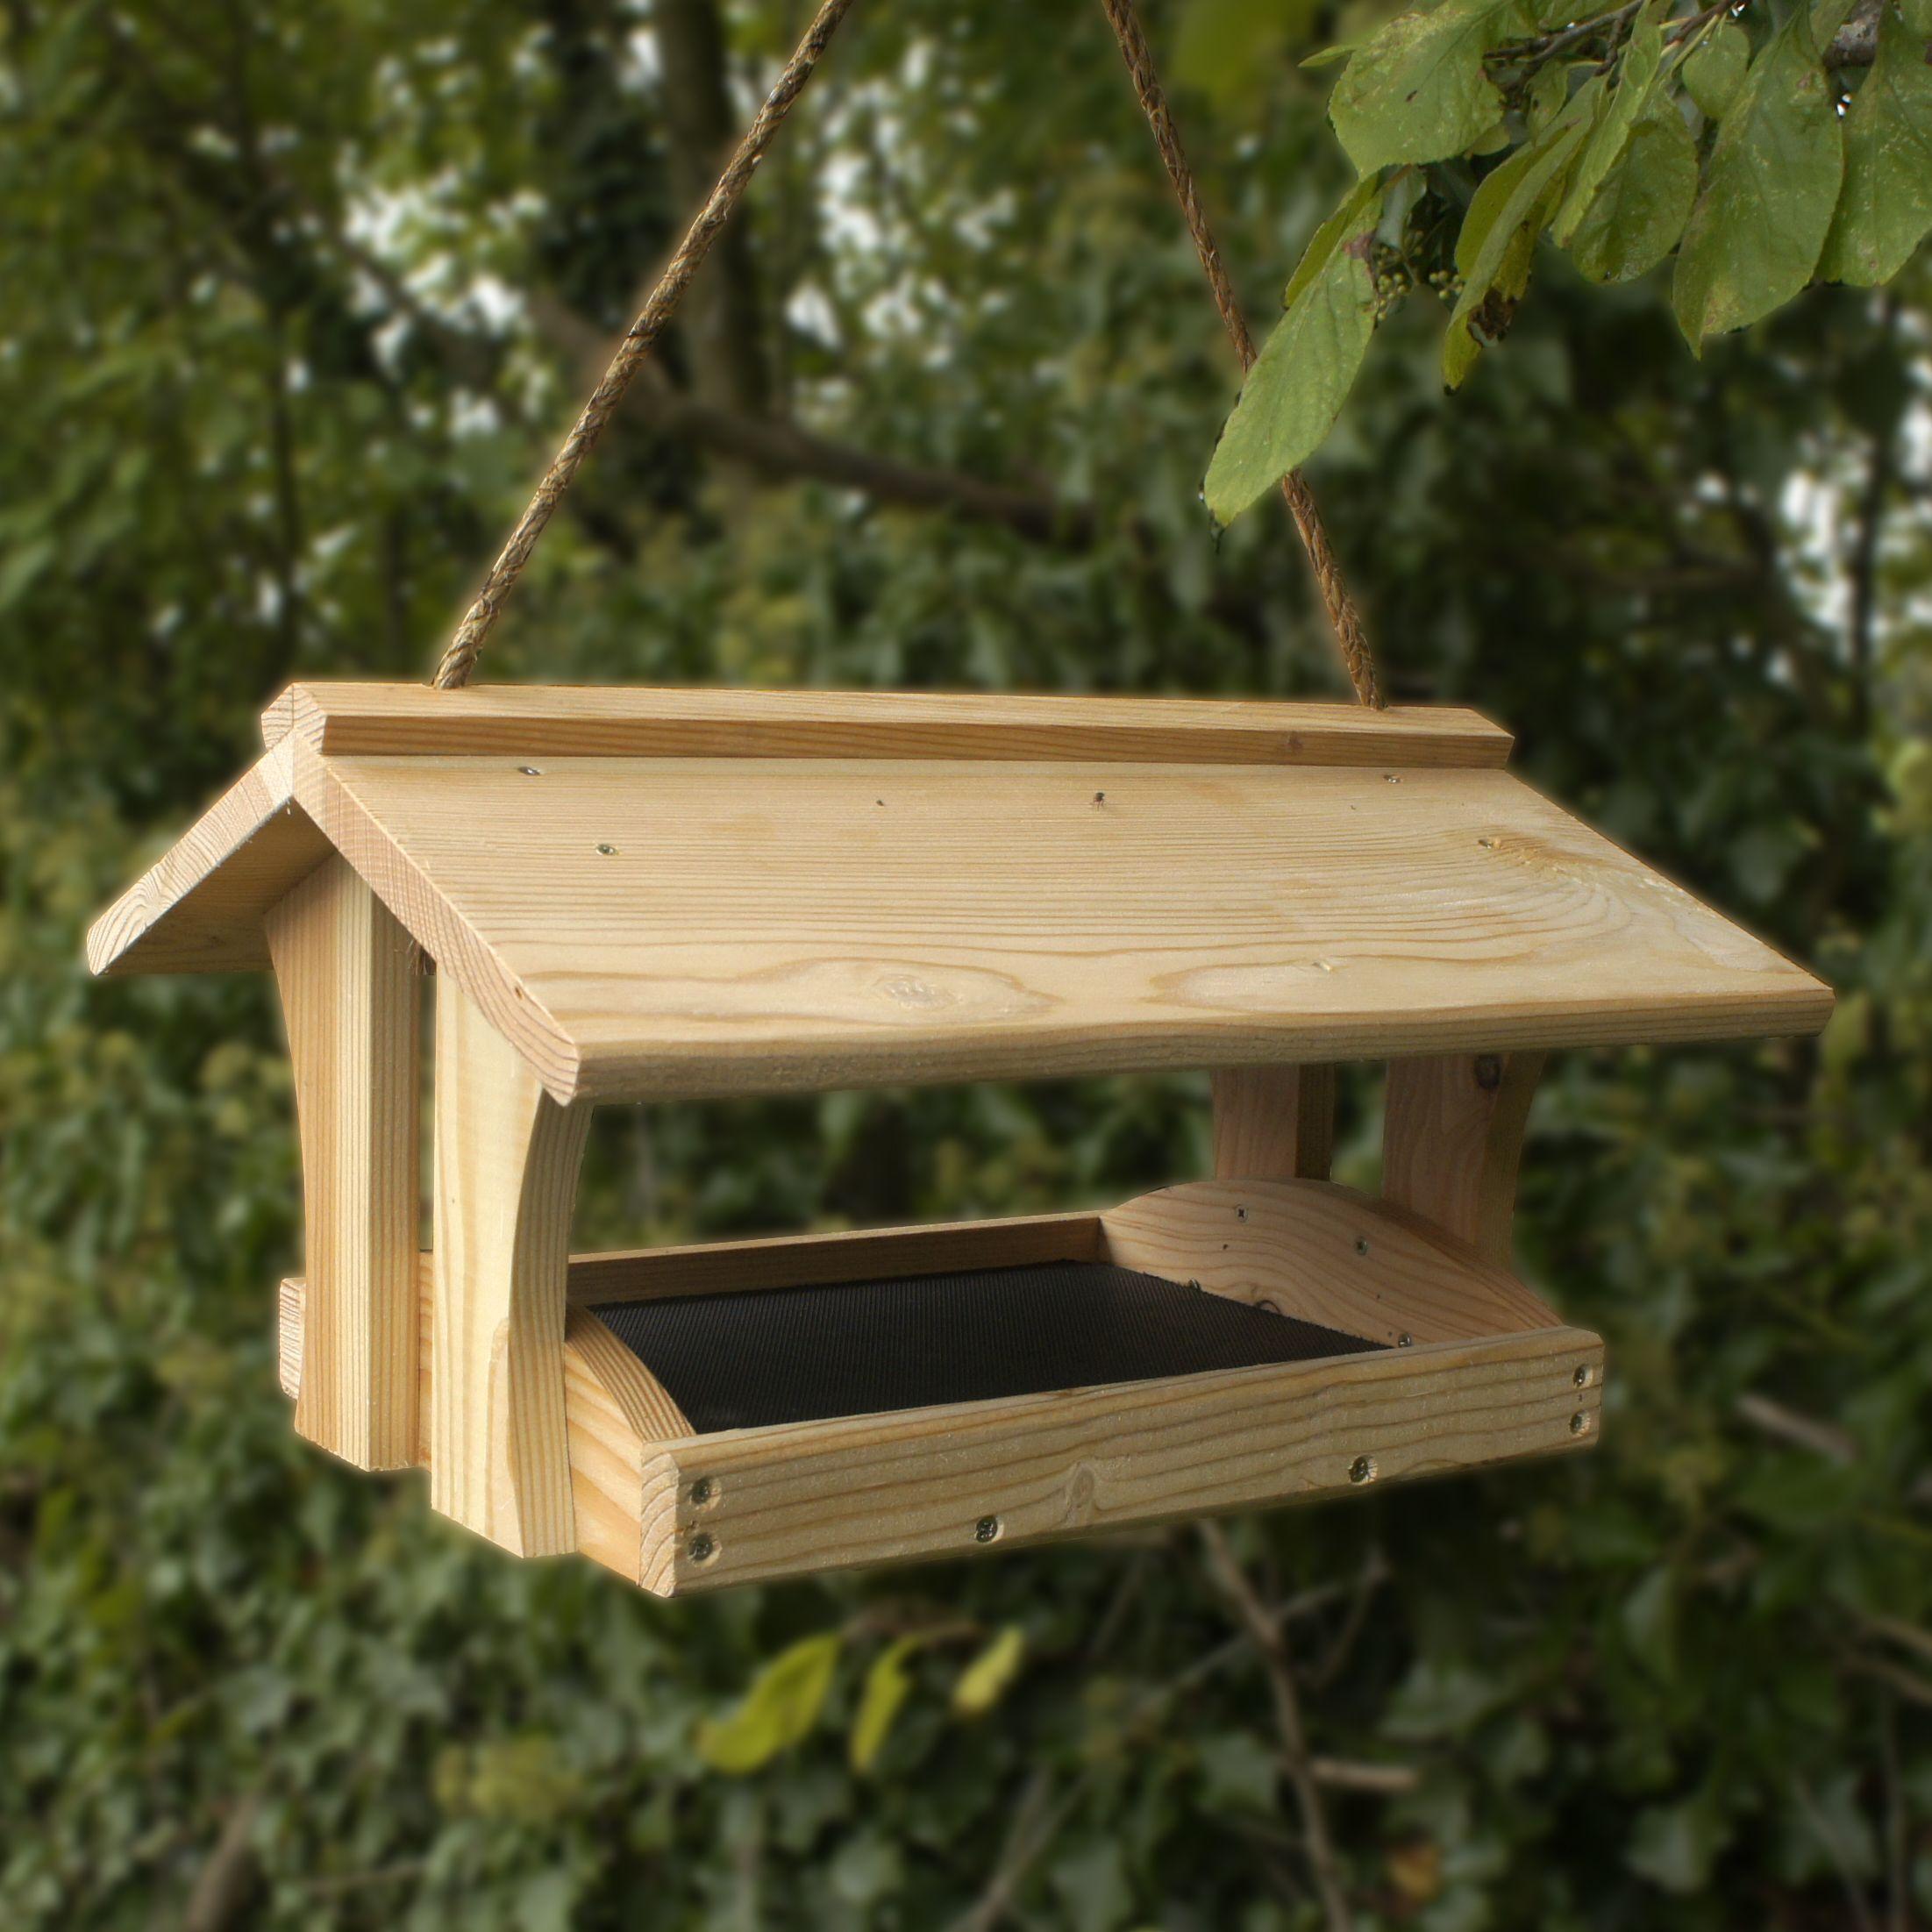 Learn Plans Wooden Bird Feeders How To Make Wooden Bird Feeders Cool Woodworking Plans One Well Li Wood Bird Feeder Wooden Bird Feeders Hanging Bird Feeders